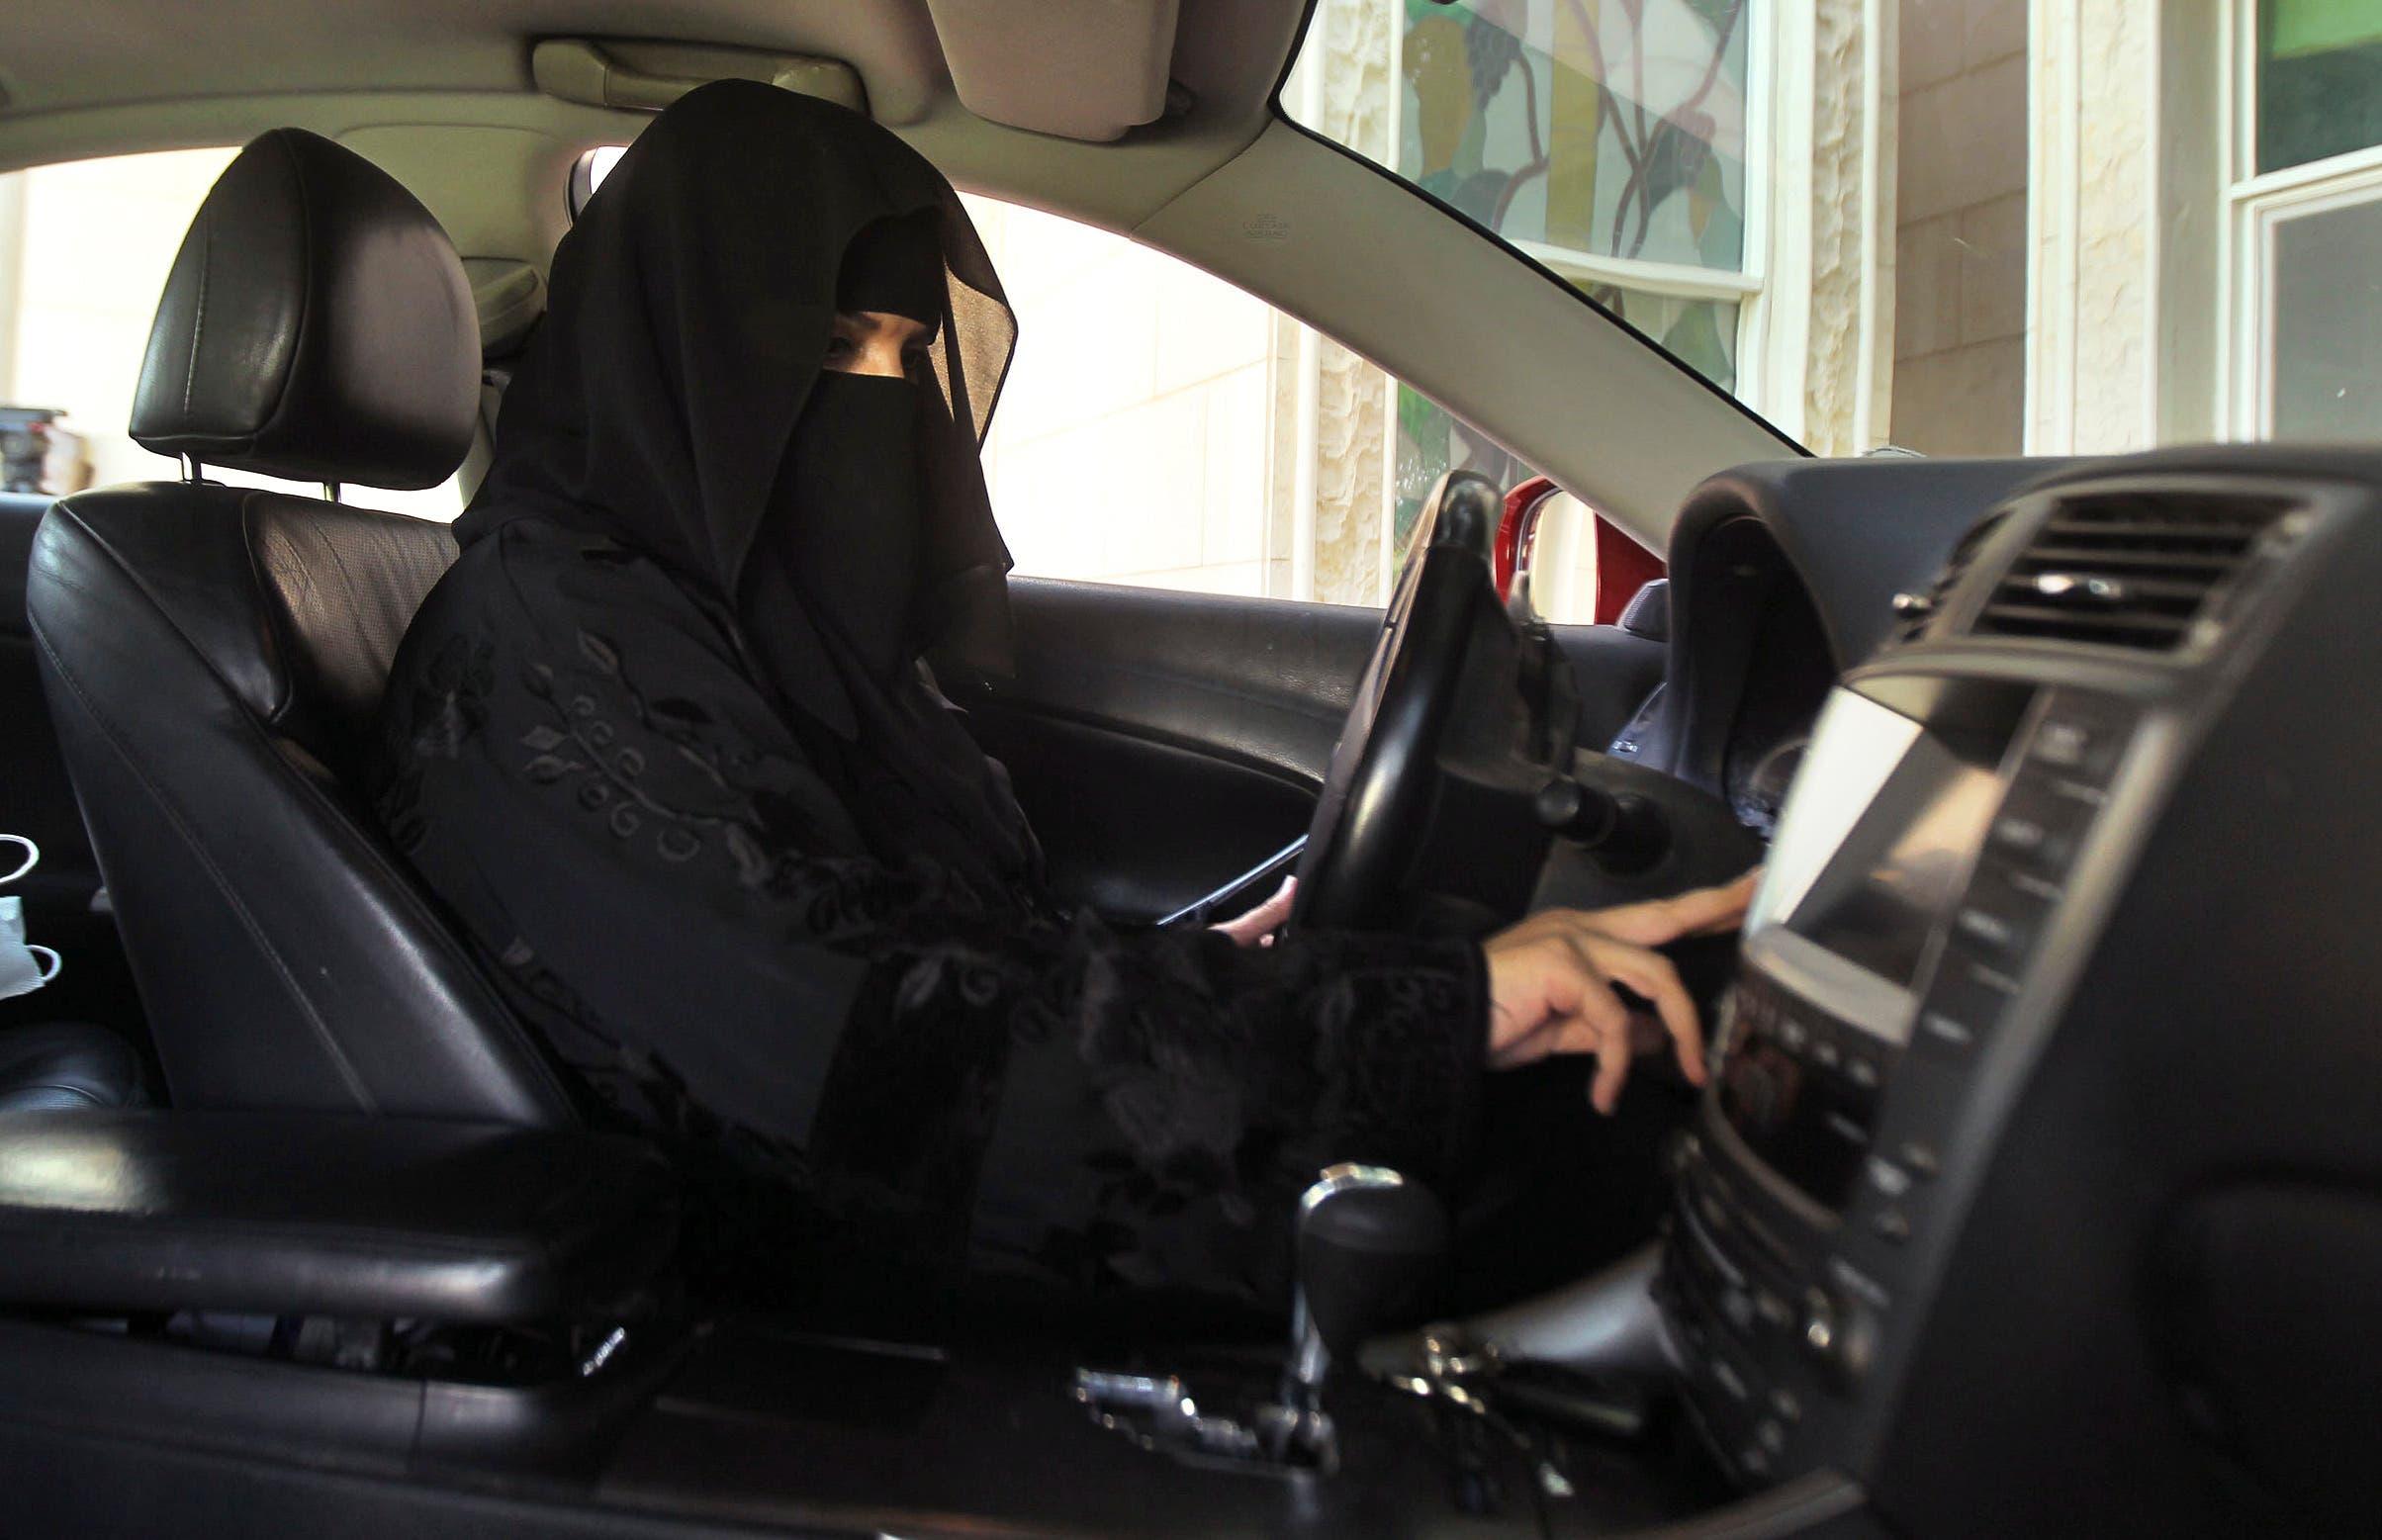 A woman drives a car in Saudi Arabia October 22, 2013.